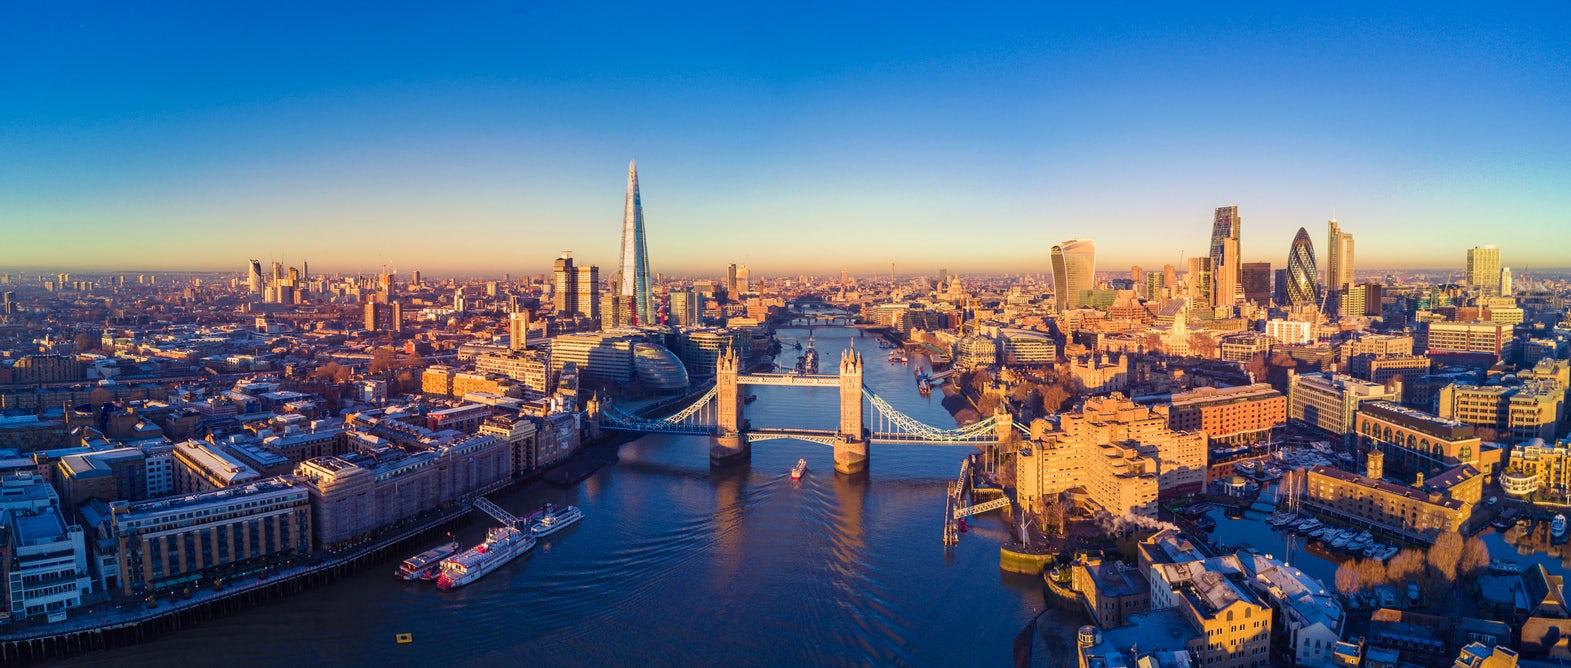 Walk on the Weird Side - London